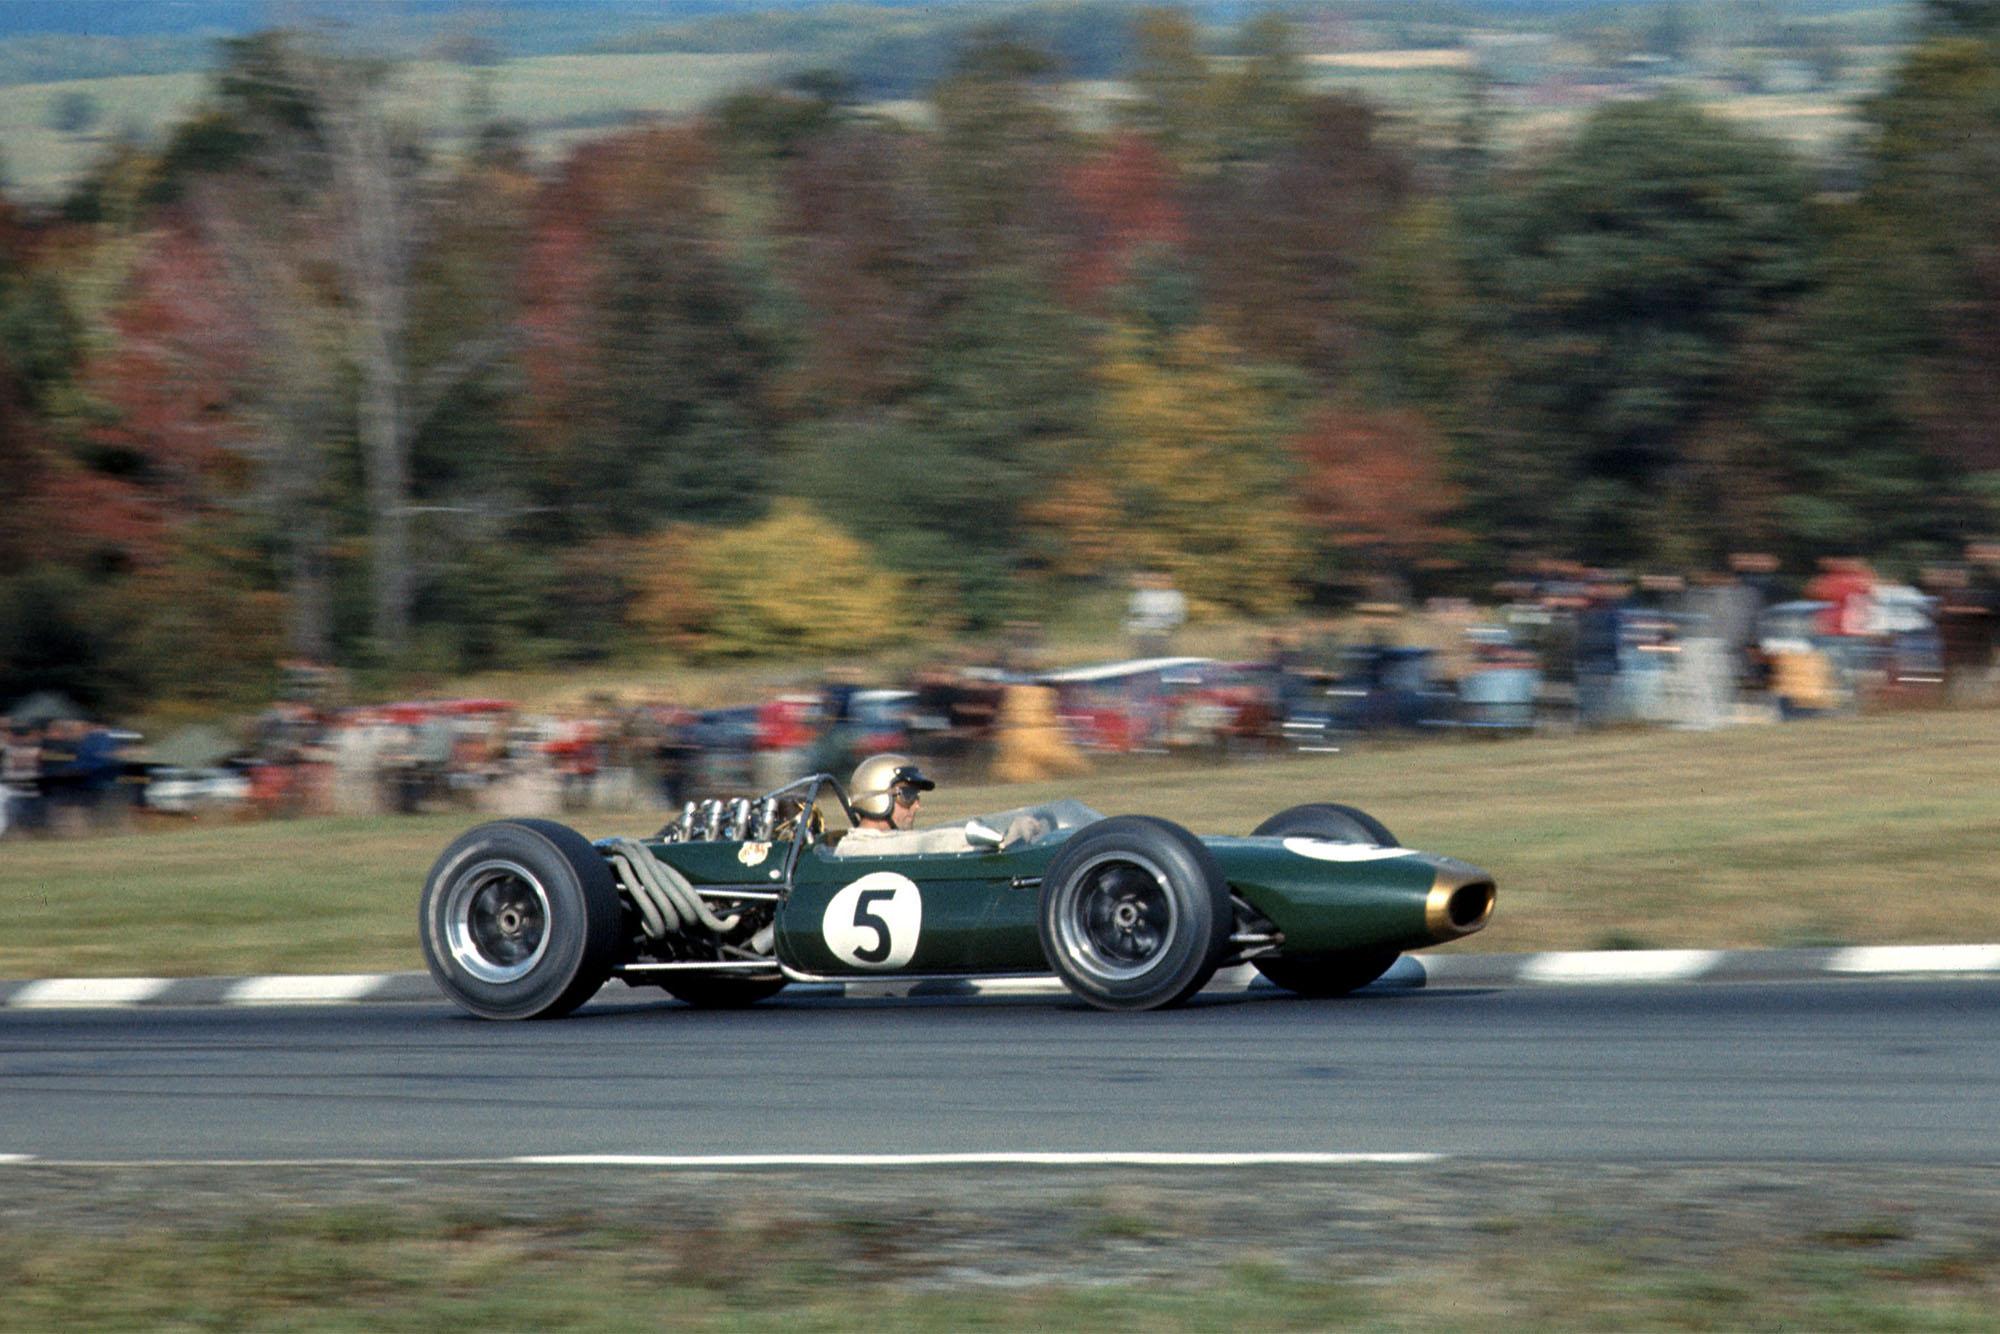 Jack Brabham (AUS) Brabham BT20, did not finish due to engine failure.